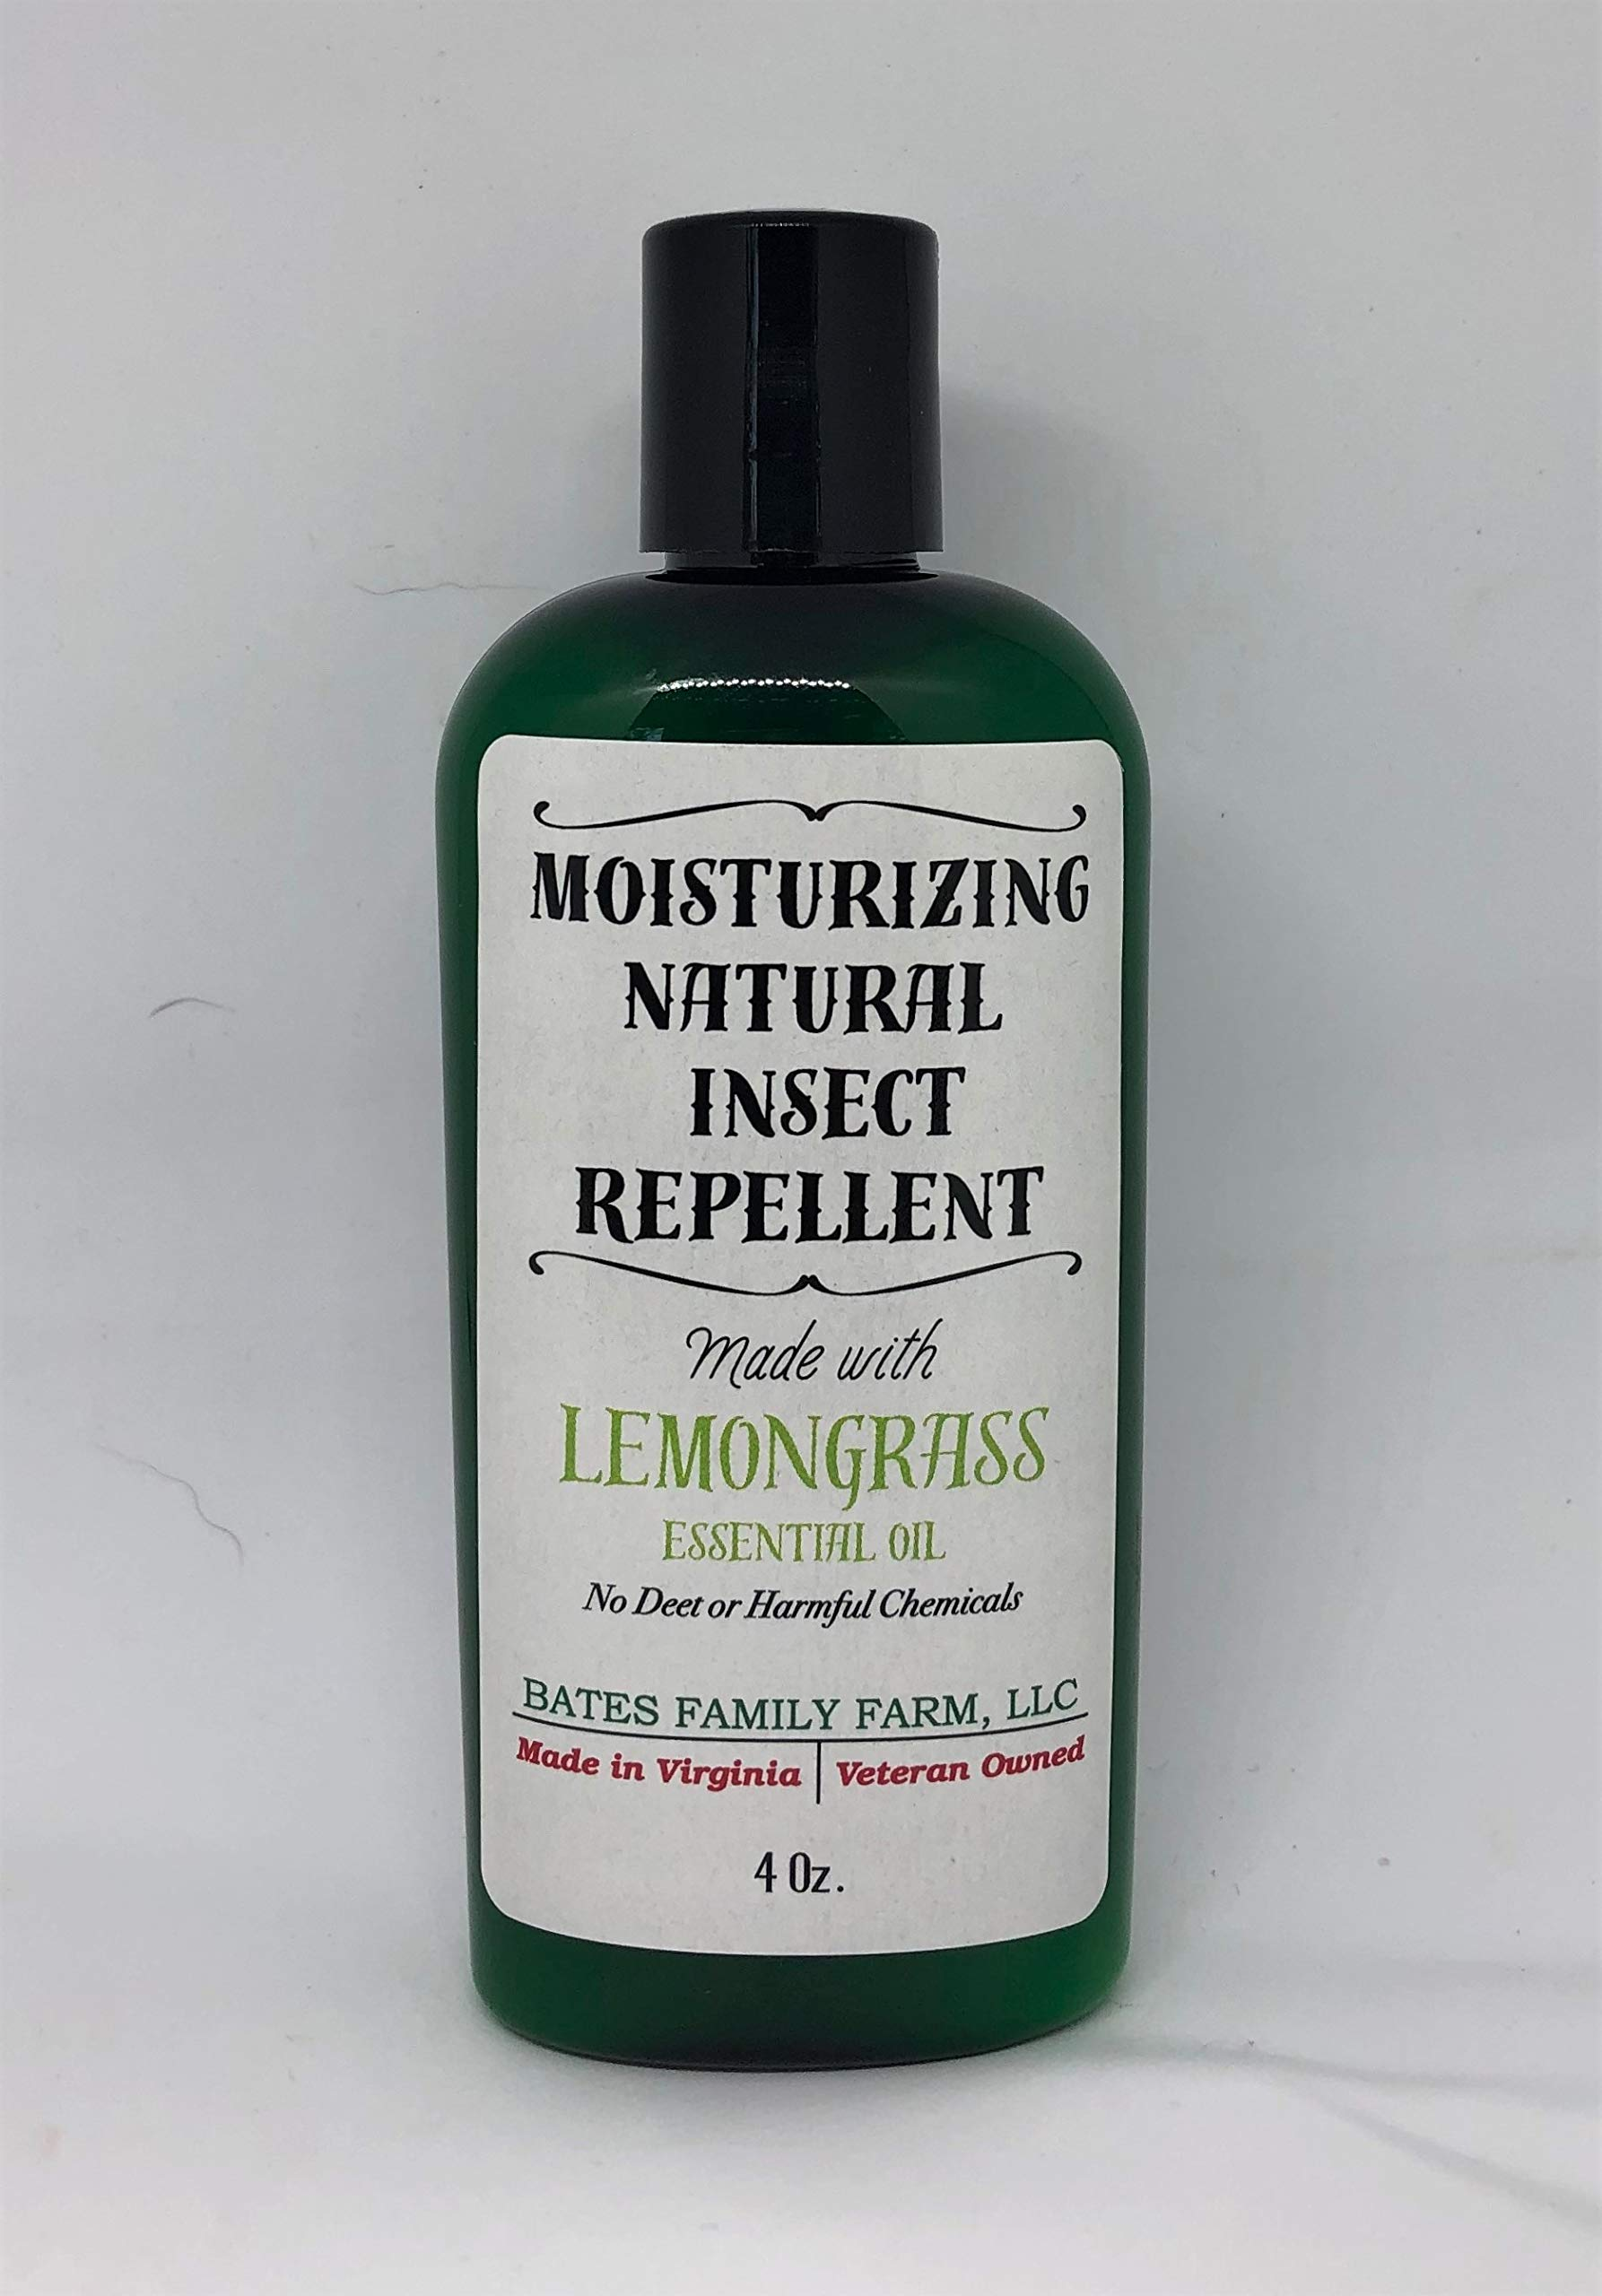 Bates Family Farm Moisturizing Repellent